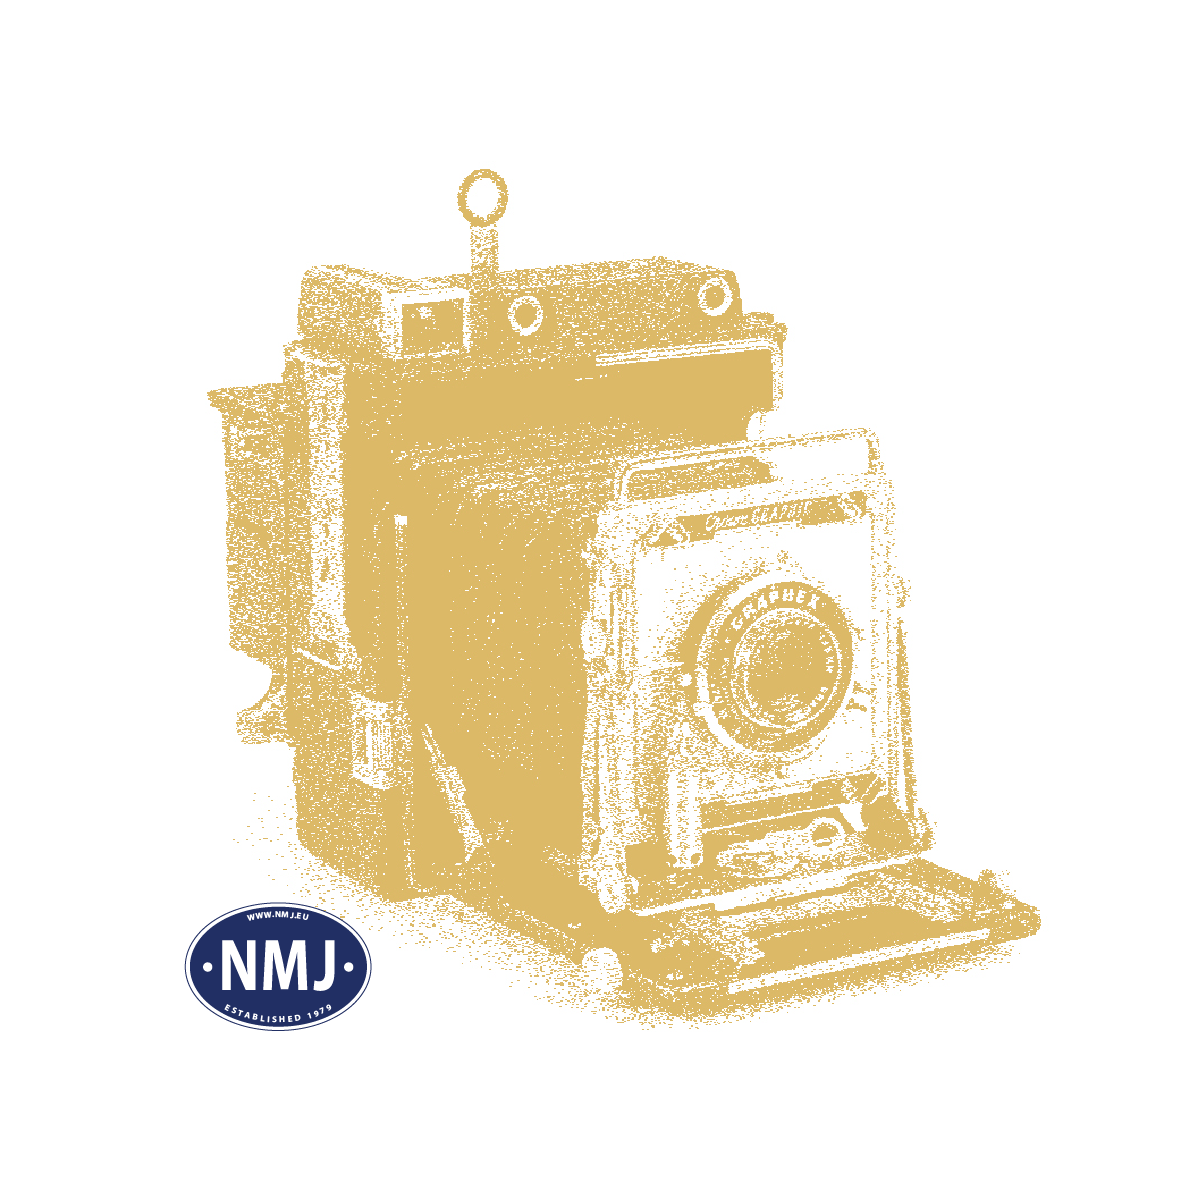 TAM82124 - LP-24 Semi Gloss Clear, Lacquer Paint, 10ml